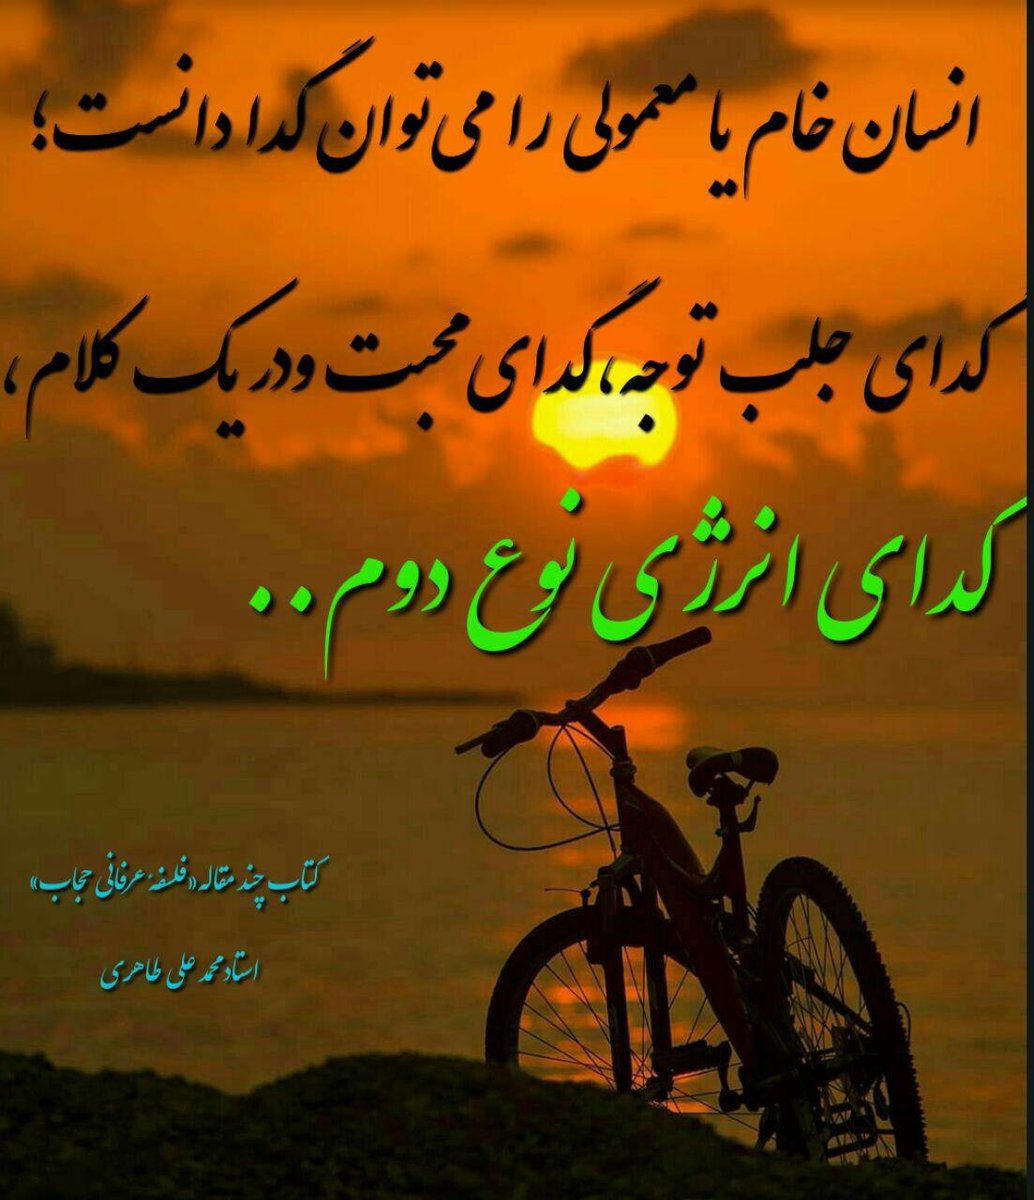 Replying to @BveVida: #Taheri_Movement